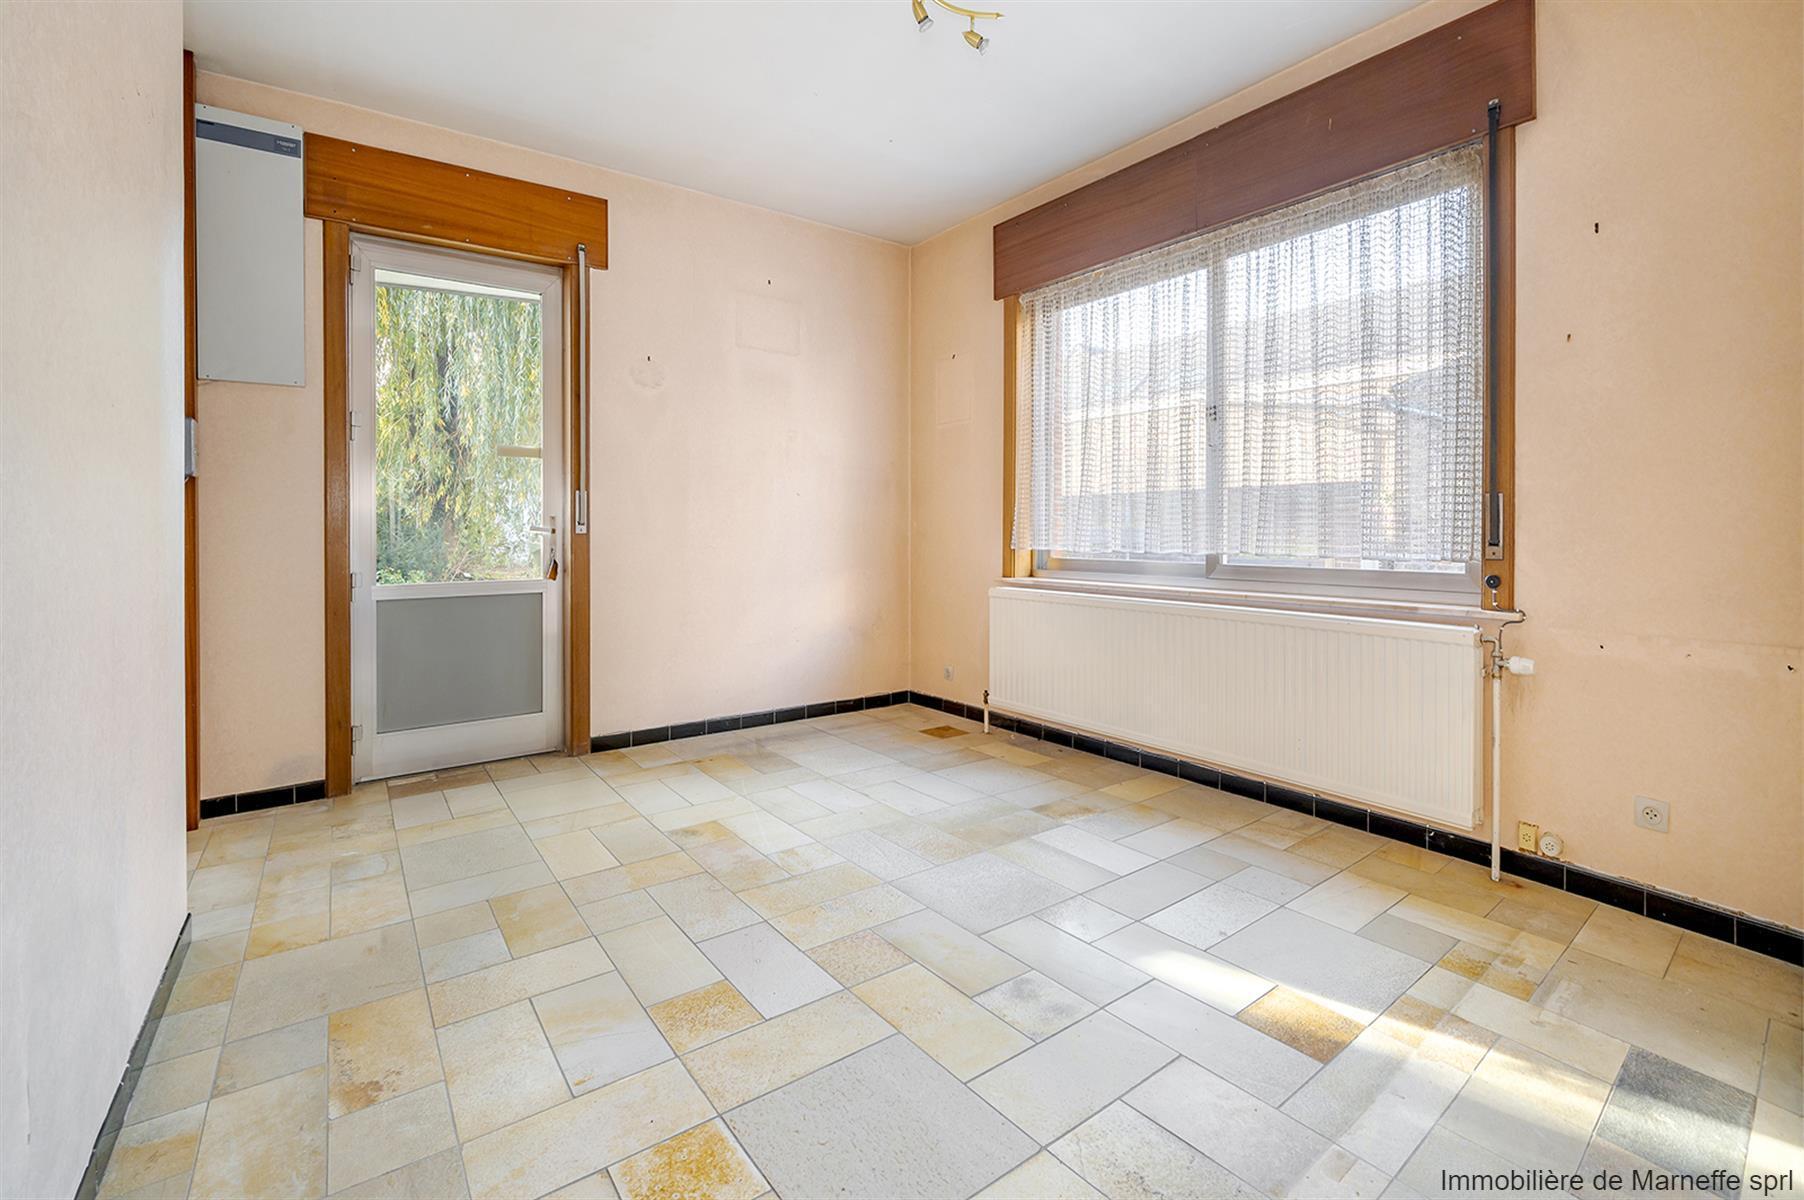 Maison - Hannut - #4204712-10